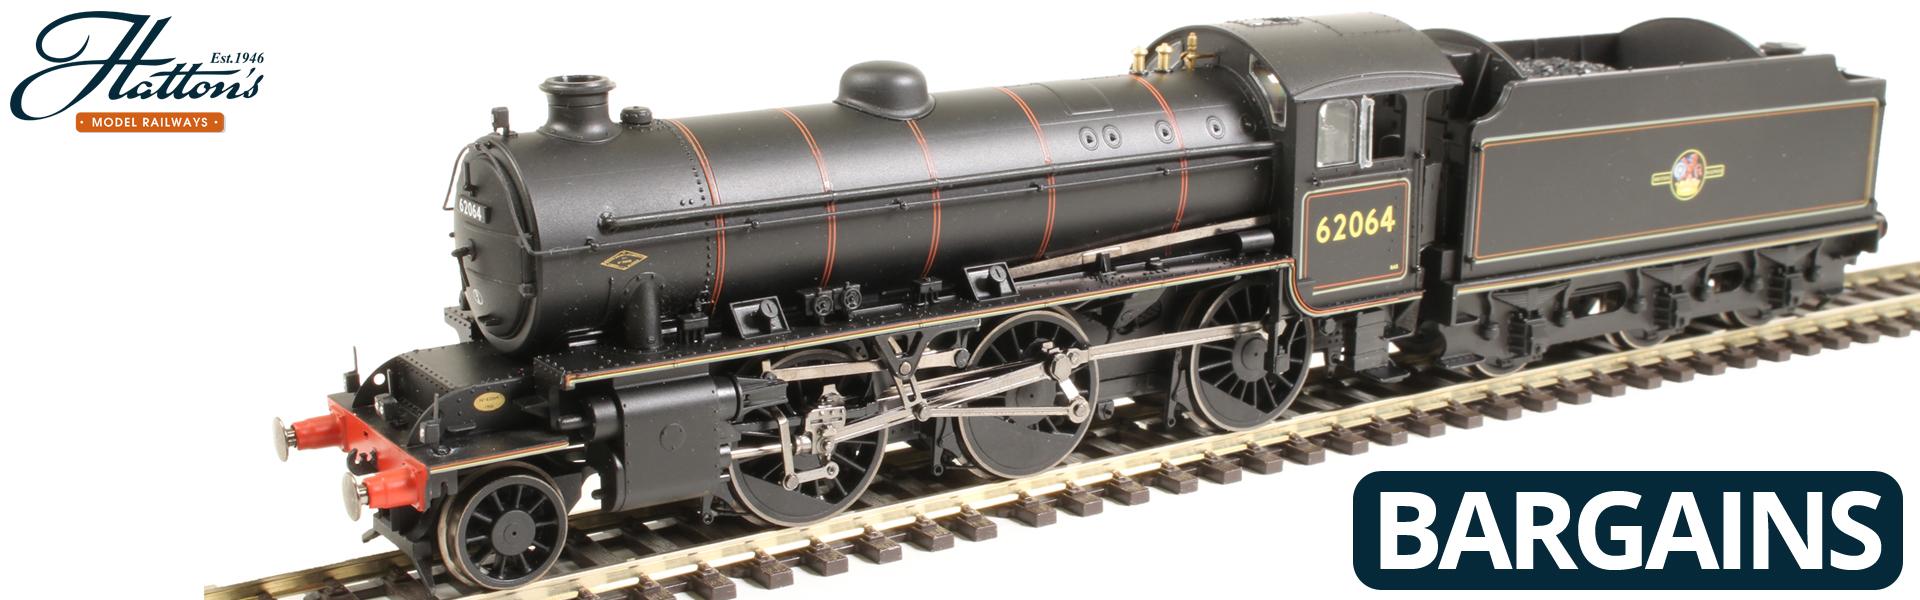 Bargain Hornby Class K1 2-6-0s from Hattons Model Railways